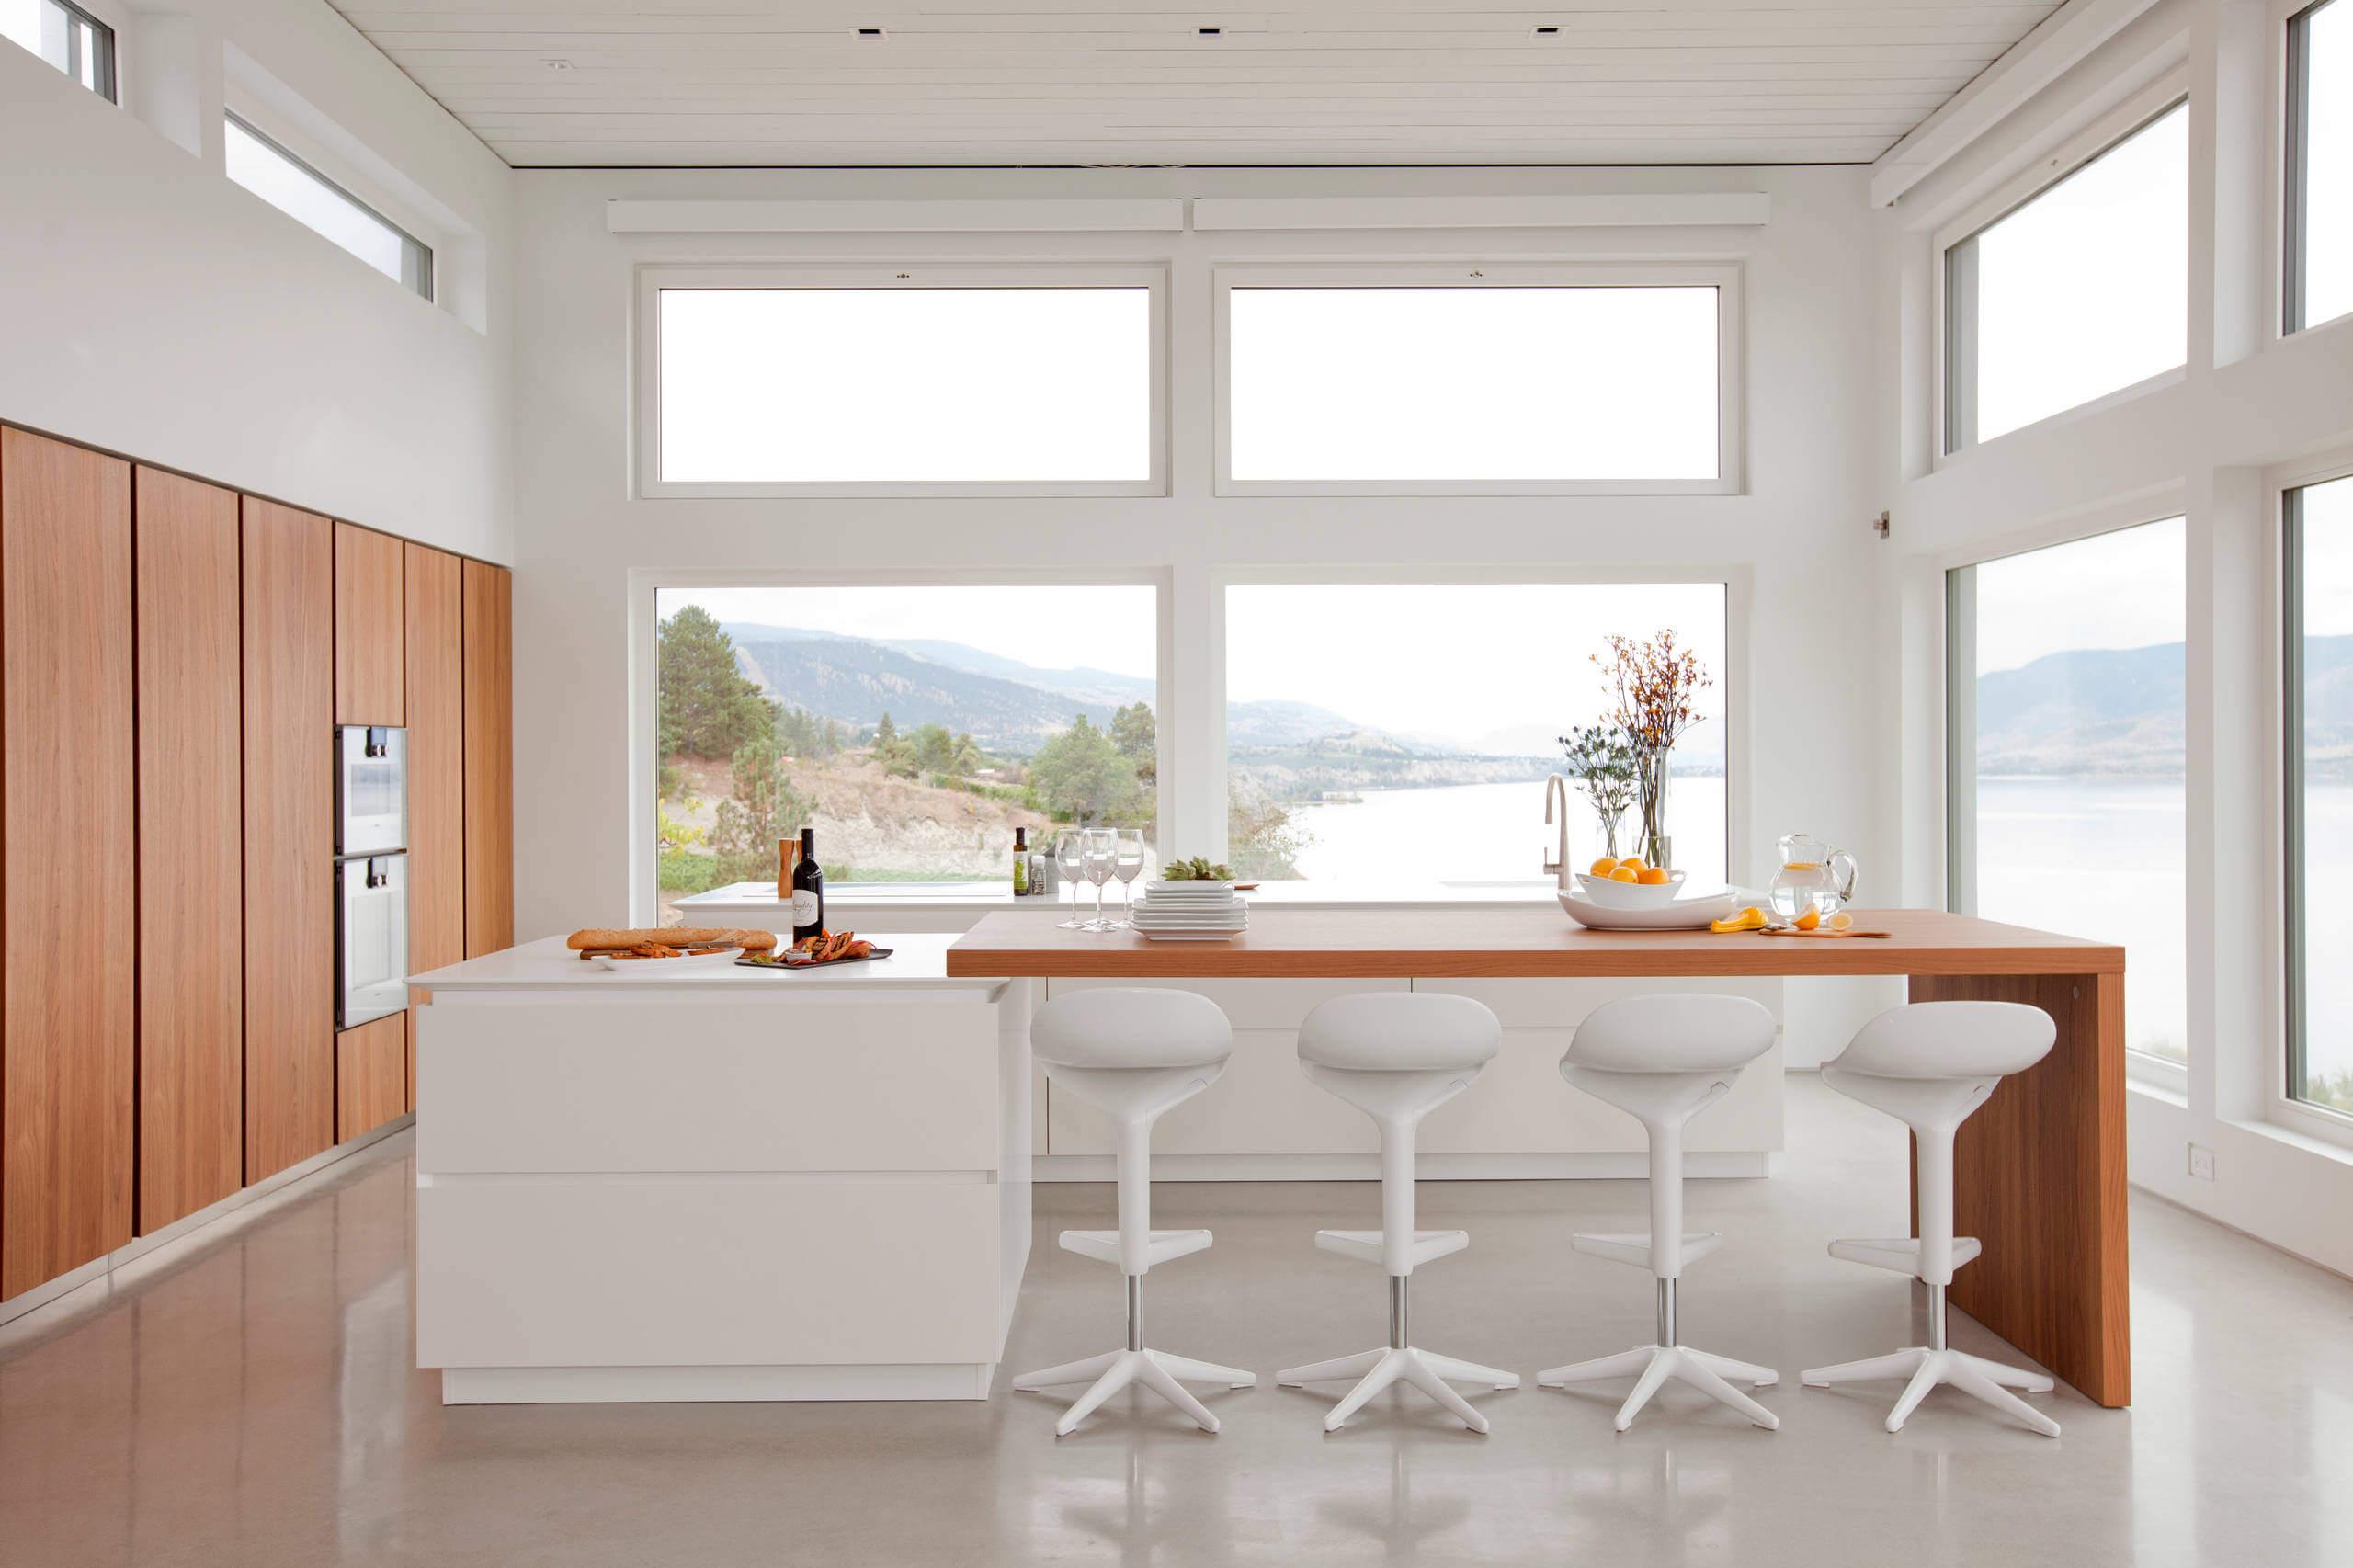 naramata-bench-house-ritchie-construction-21